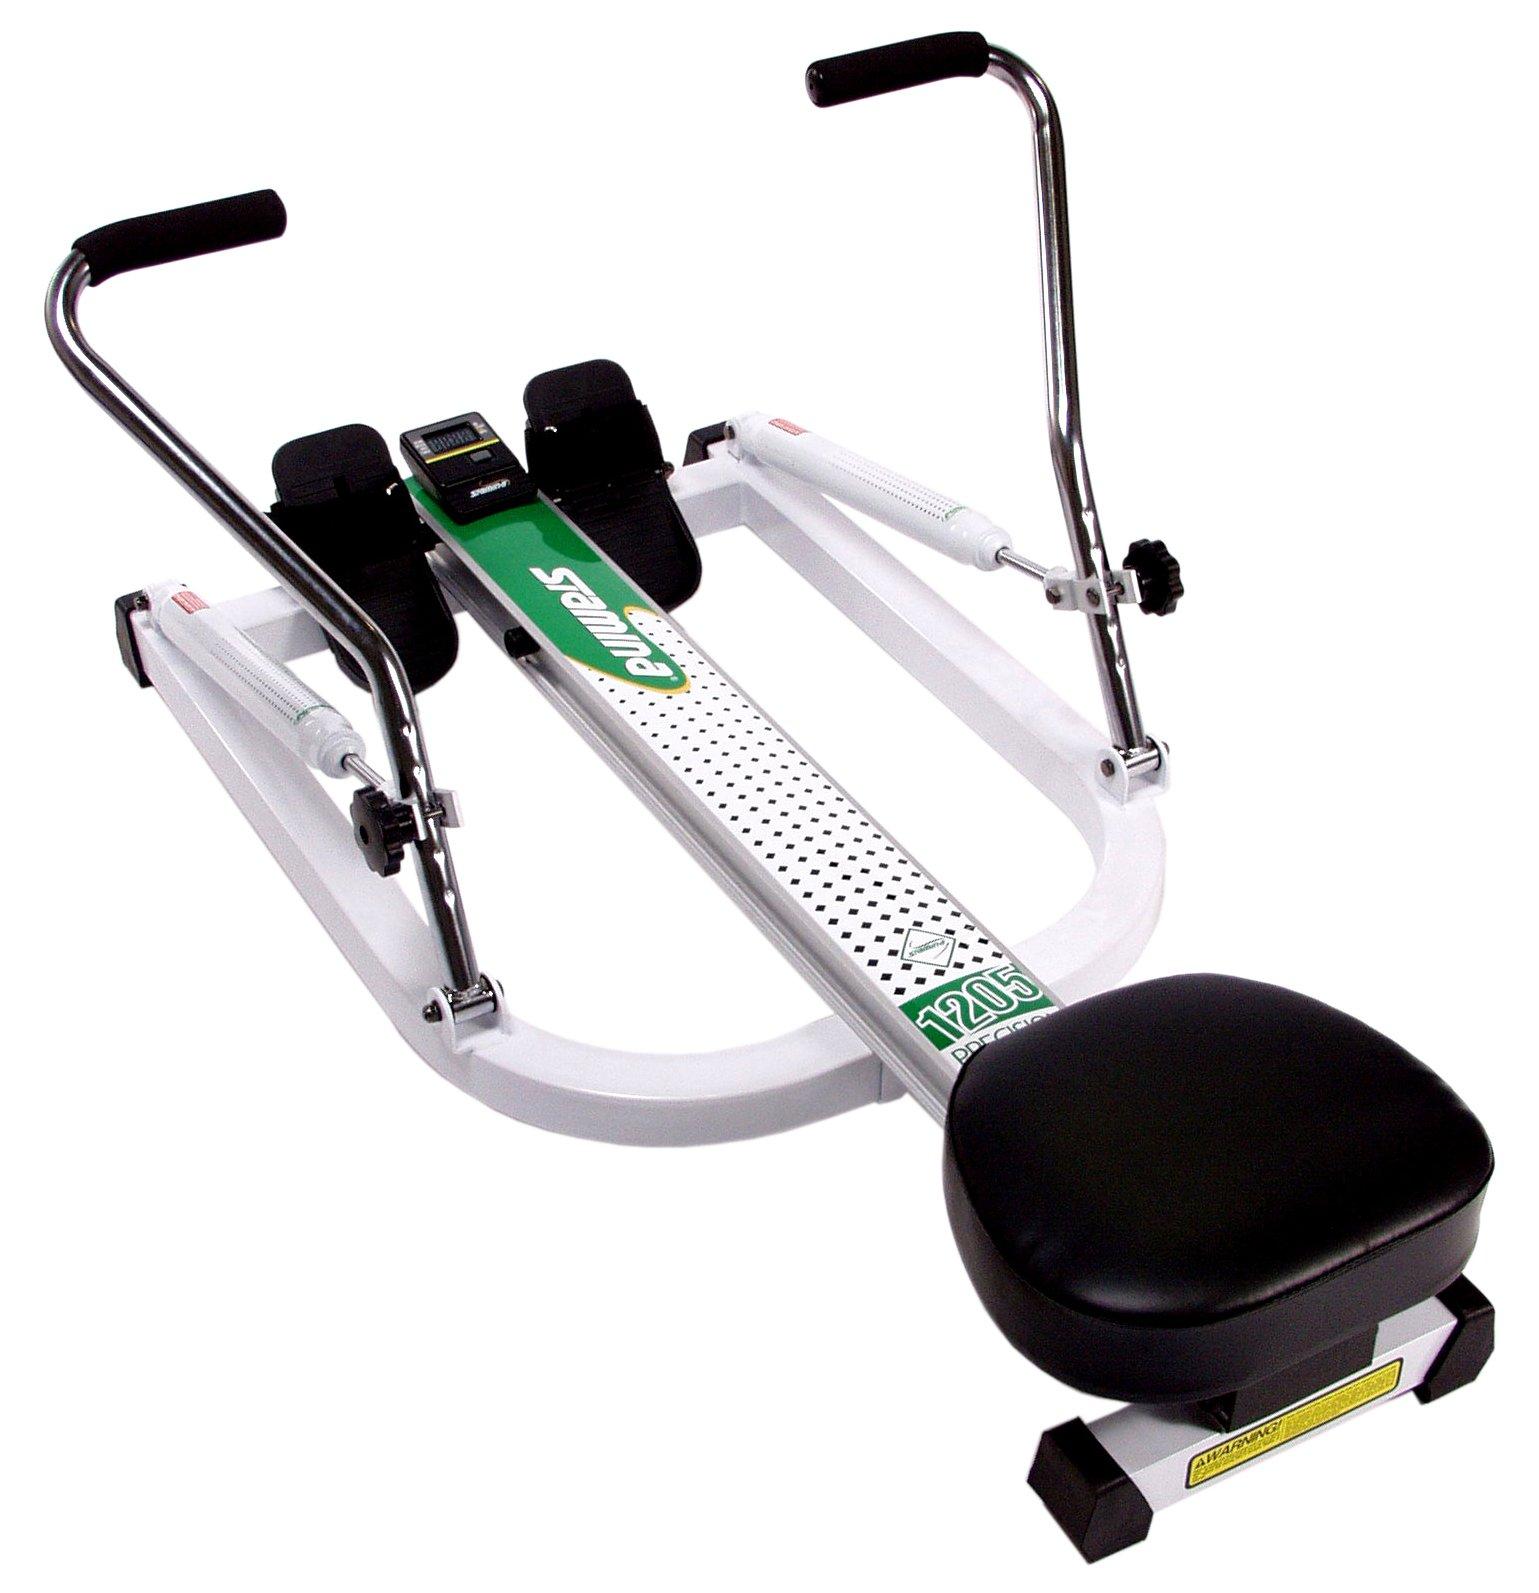 Stamina 1205 Precision Rower by Stamina (Image #1)